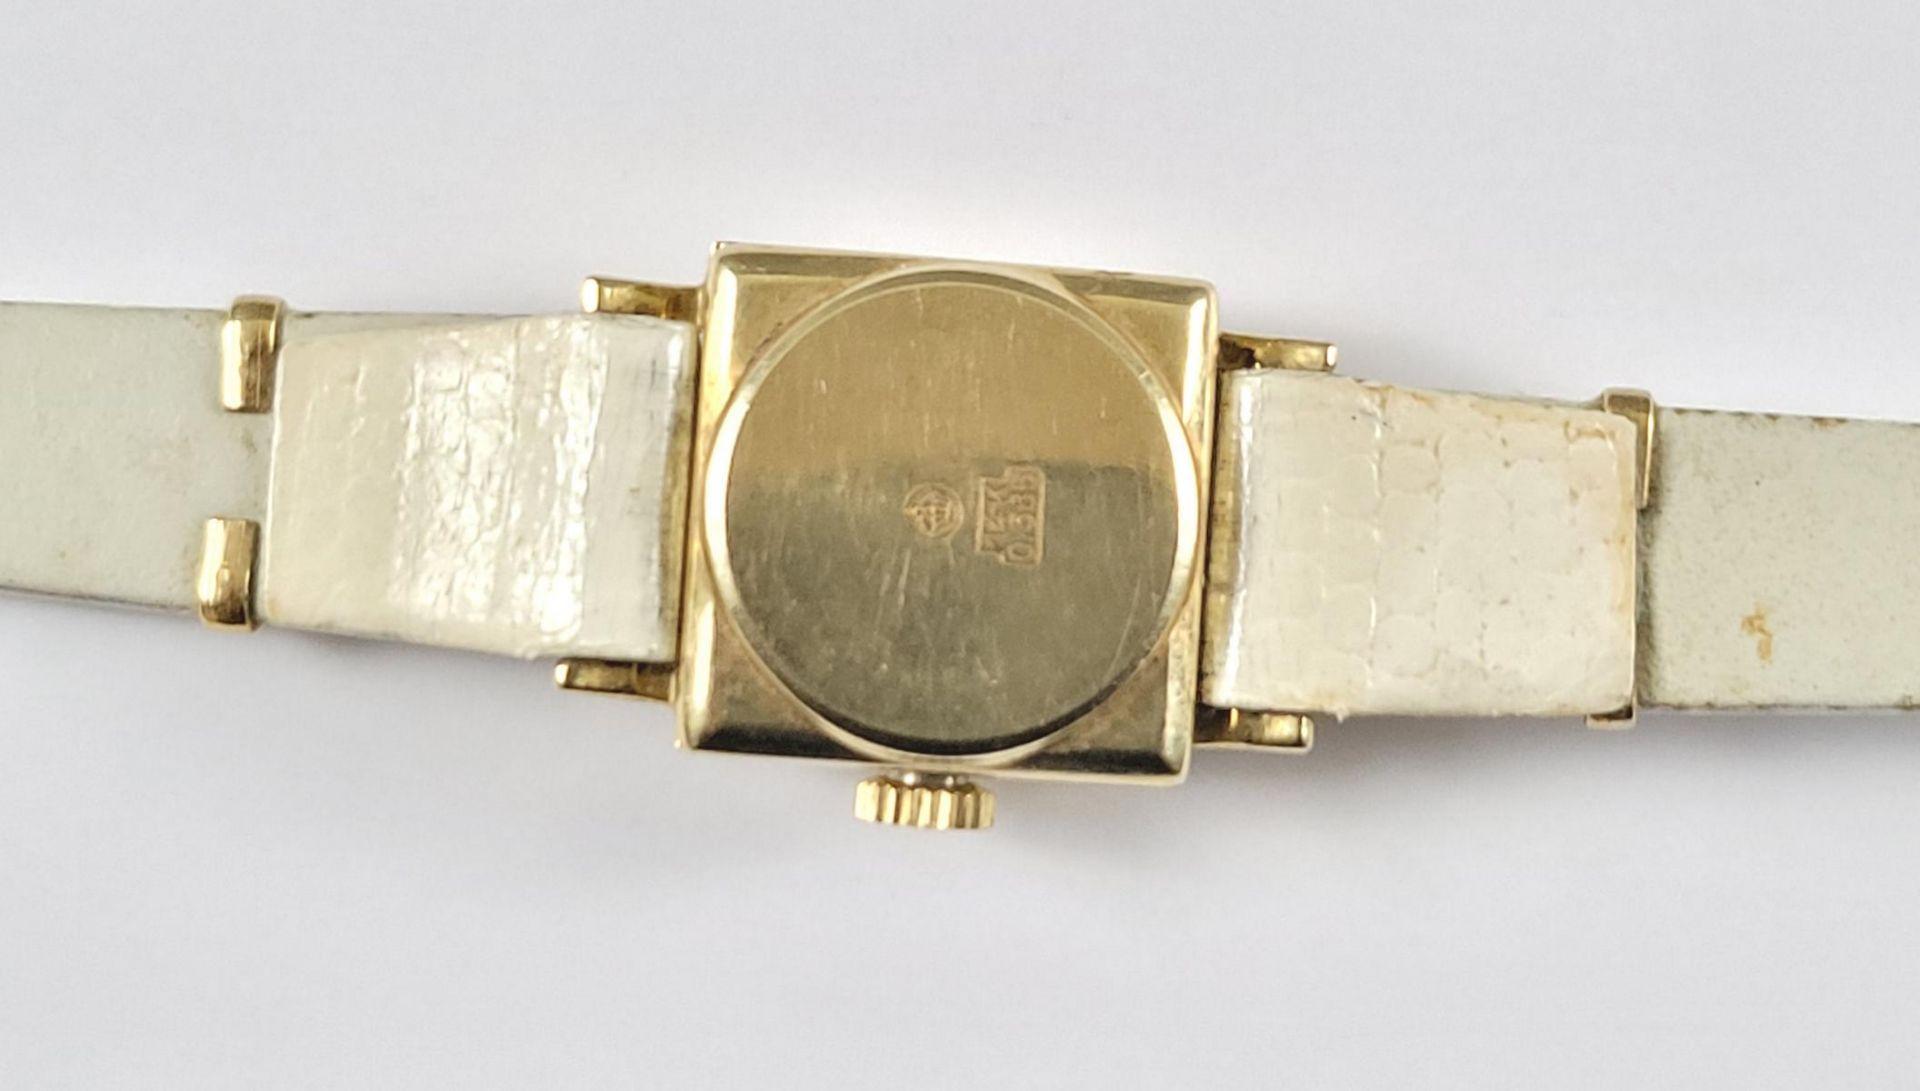 Goldene Roxy Damenarmbanduhr, 14 Karat Gelbgold - Bild 4 aus 4